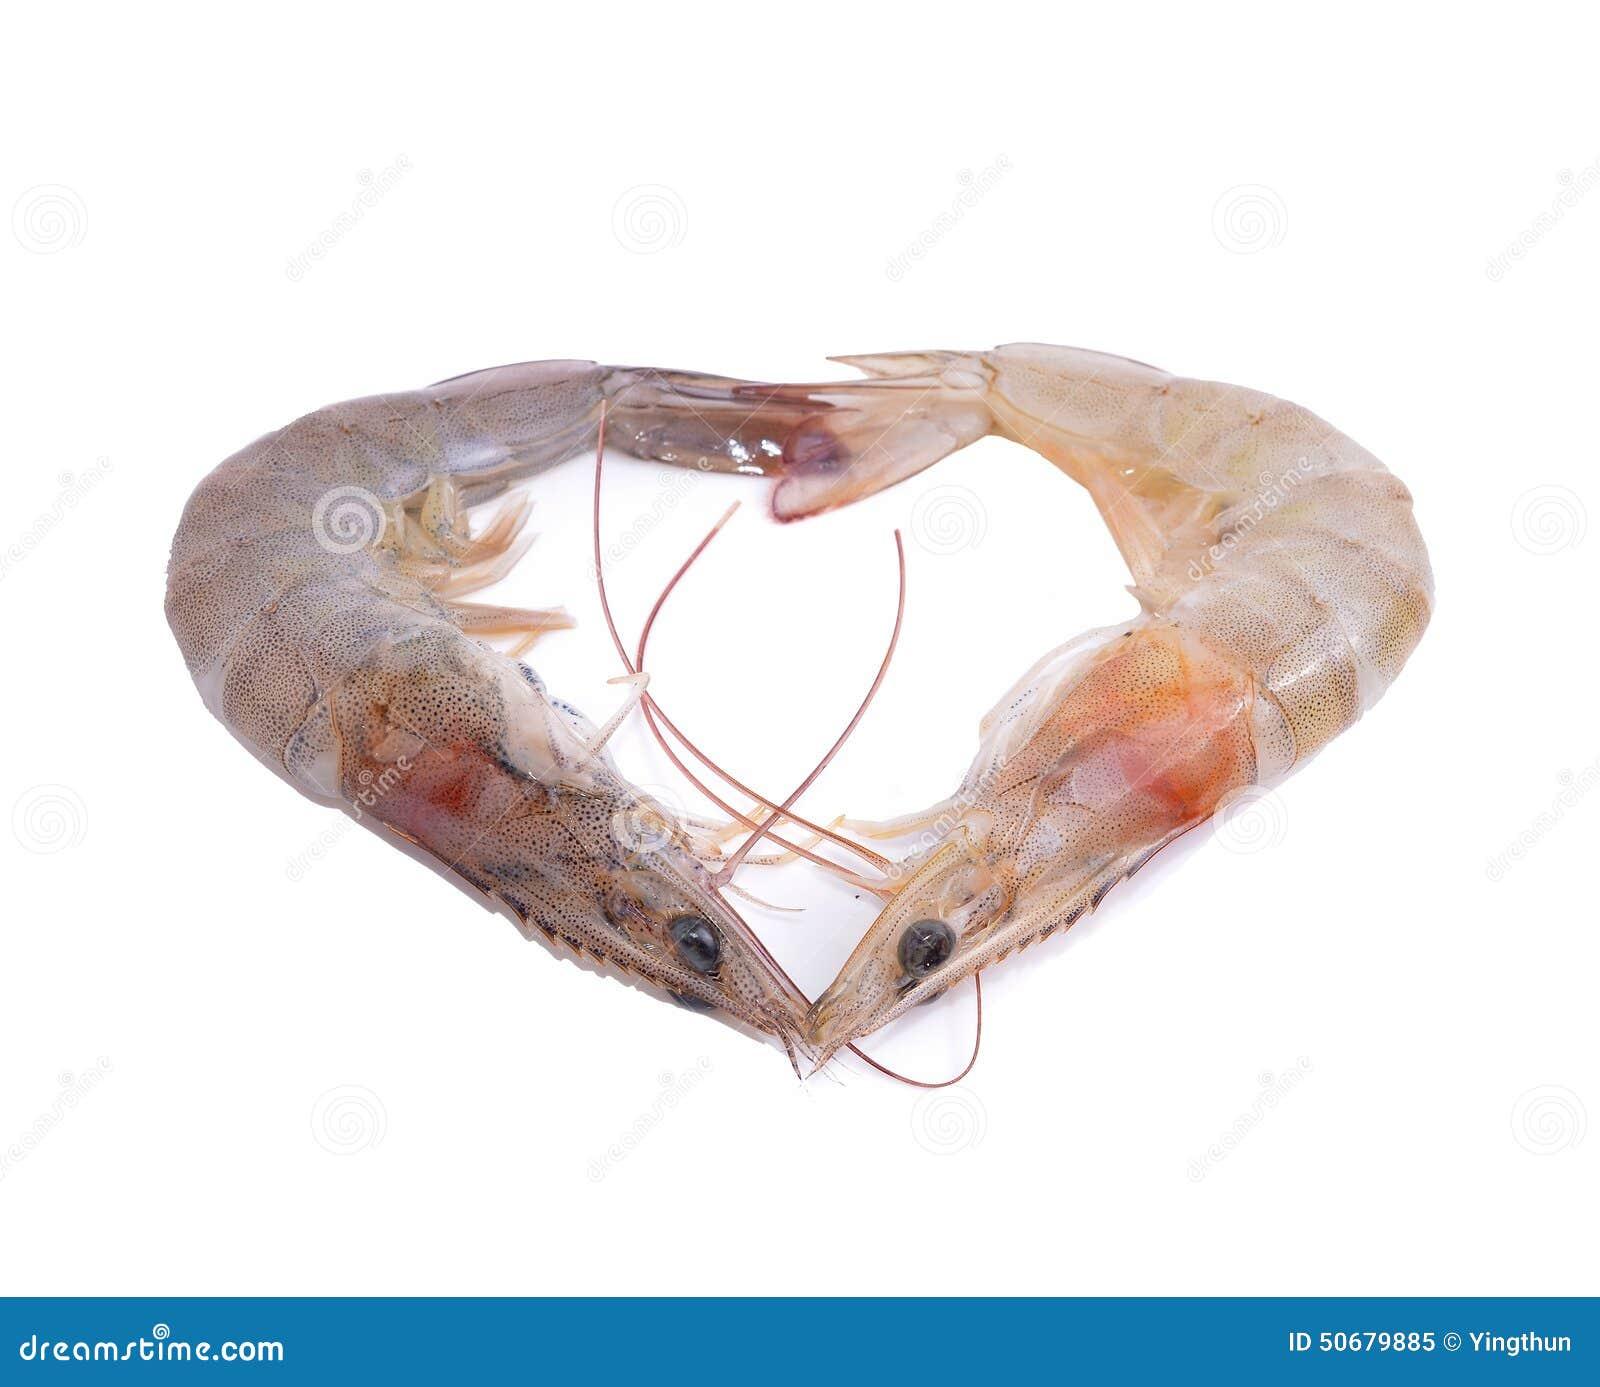 Download 虾有白色背景 库存图片. 图片 包括有 甲壳动物, 敌意, 空白, 自然, 重点, 可口, 大虾, 海运 - 50679885